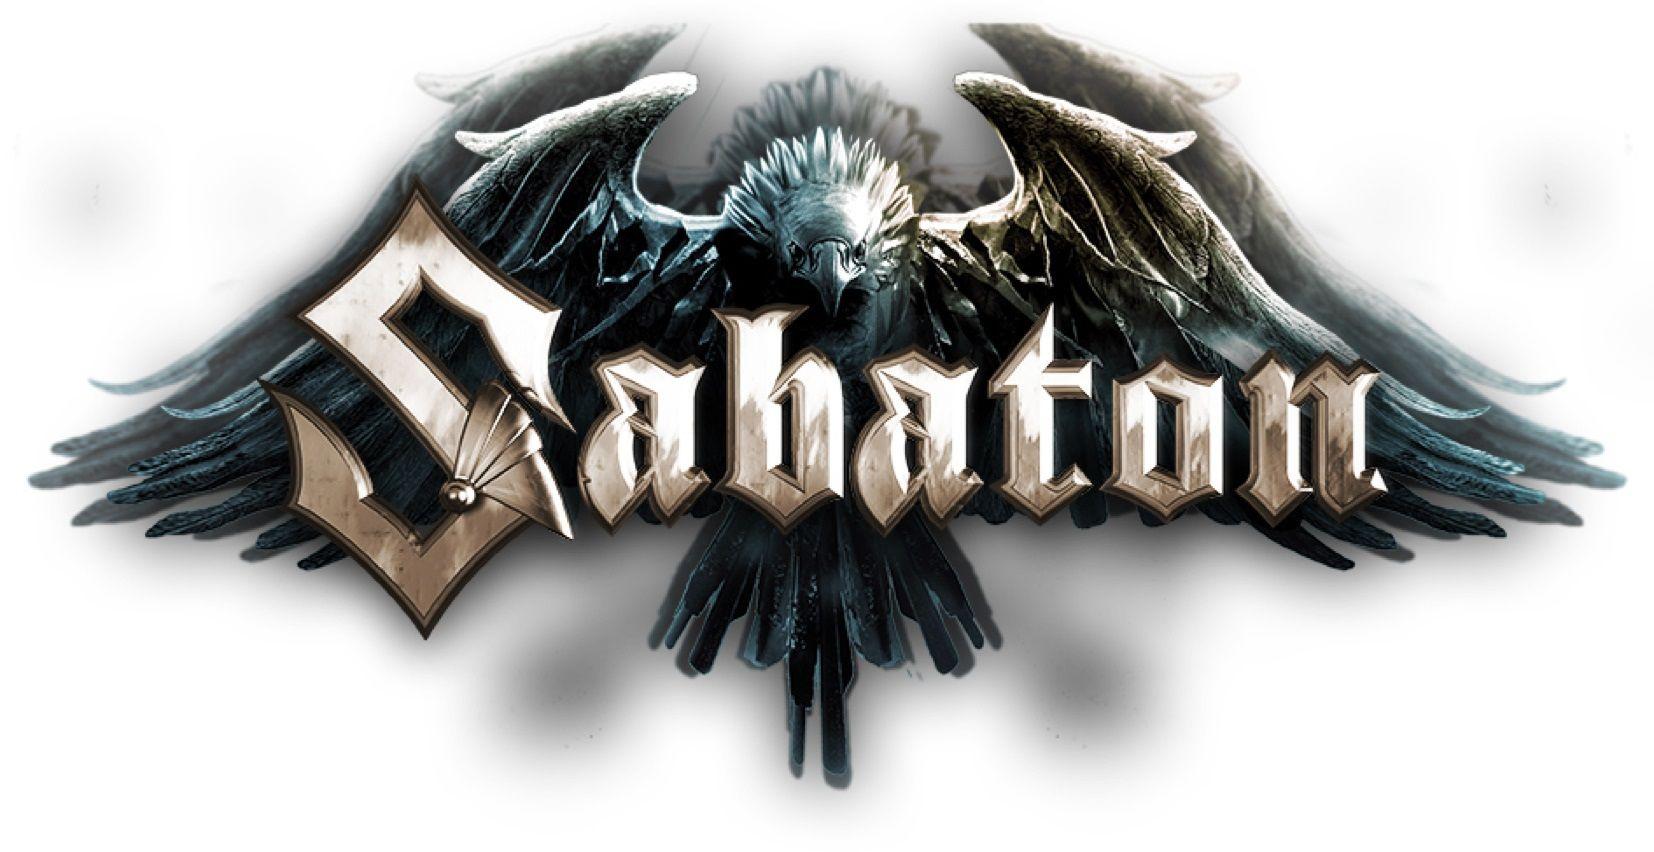 sabaton logo from album heroes sabaton in 2019 metal. Black Bedroom Furniture Sets. Home Design Ideas